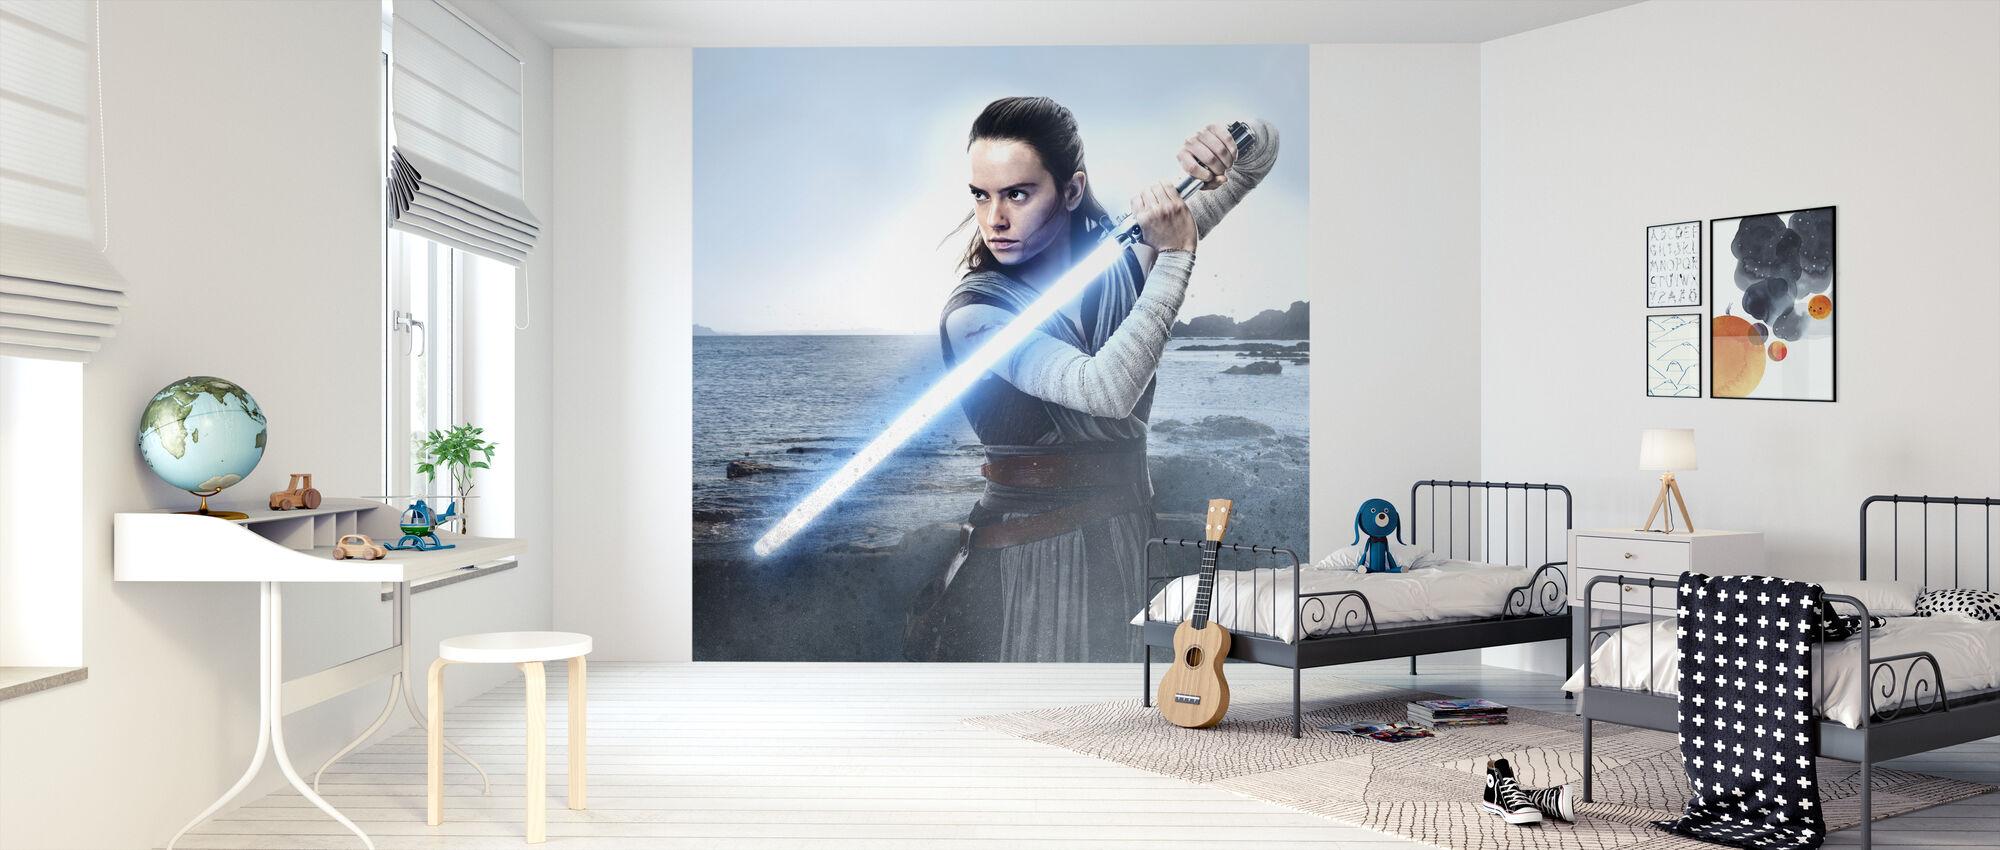 Star Wars - Rey kanssa Valonsaber - Tapetti - Lastenhuone